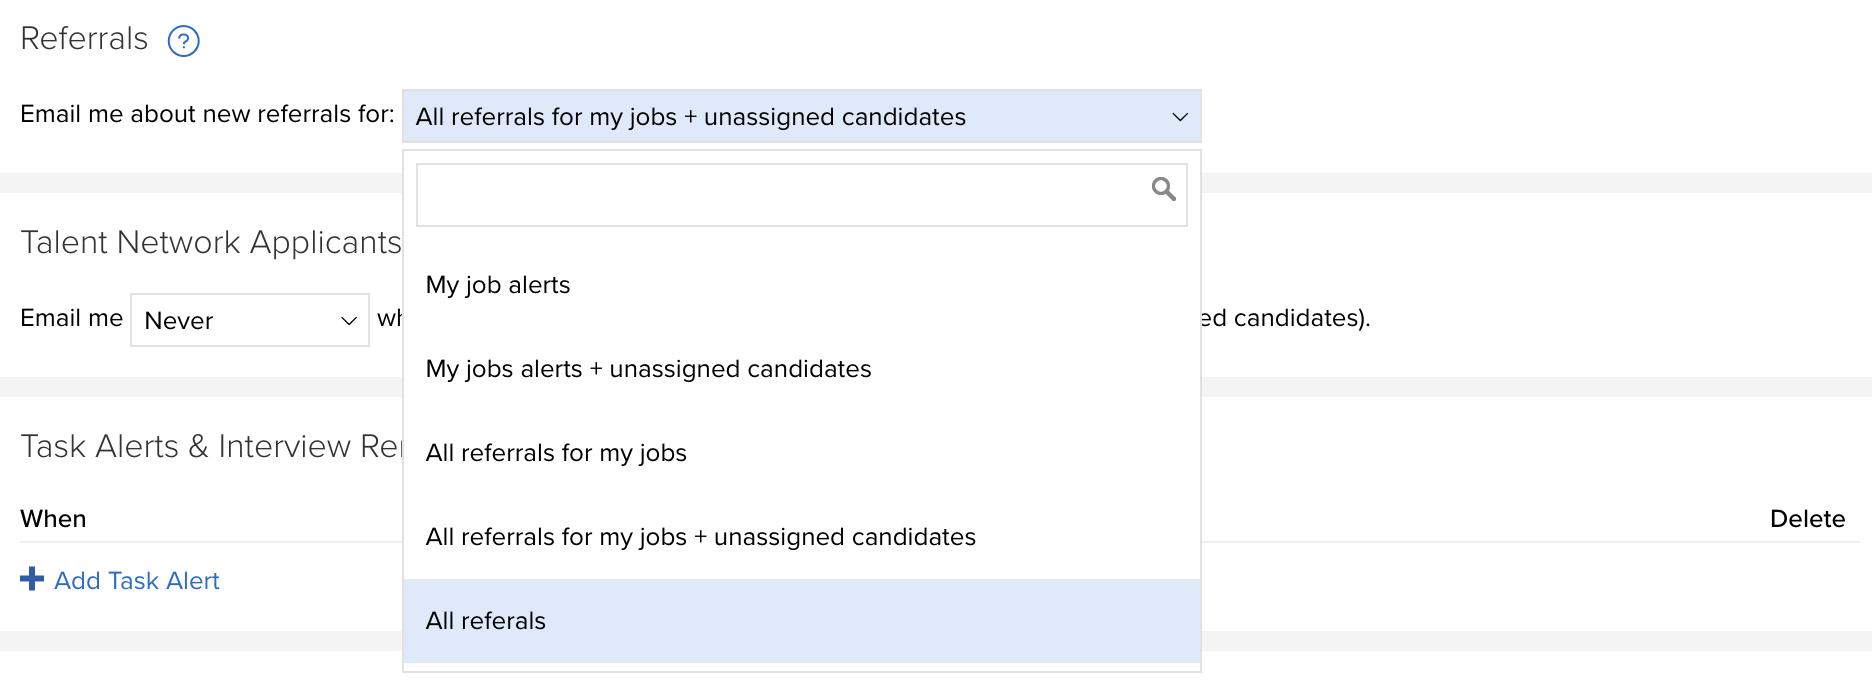 Employee Referral Notification Settings